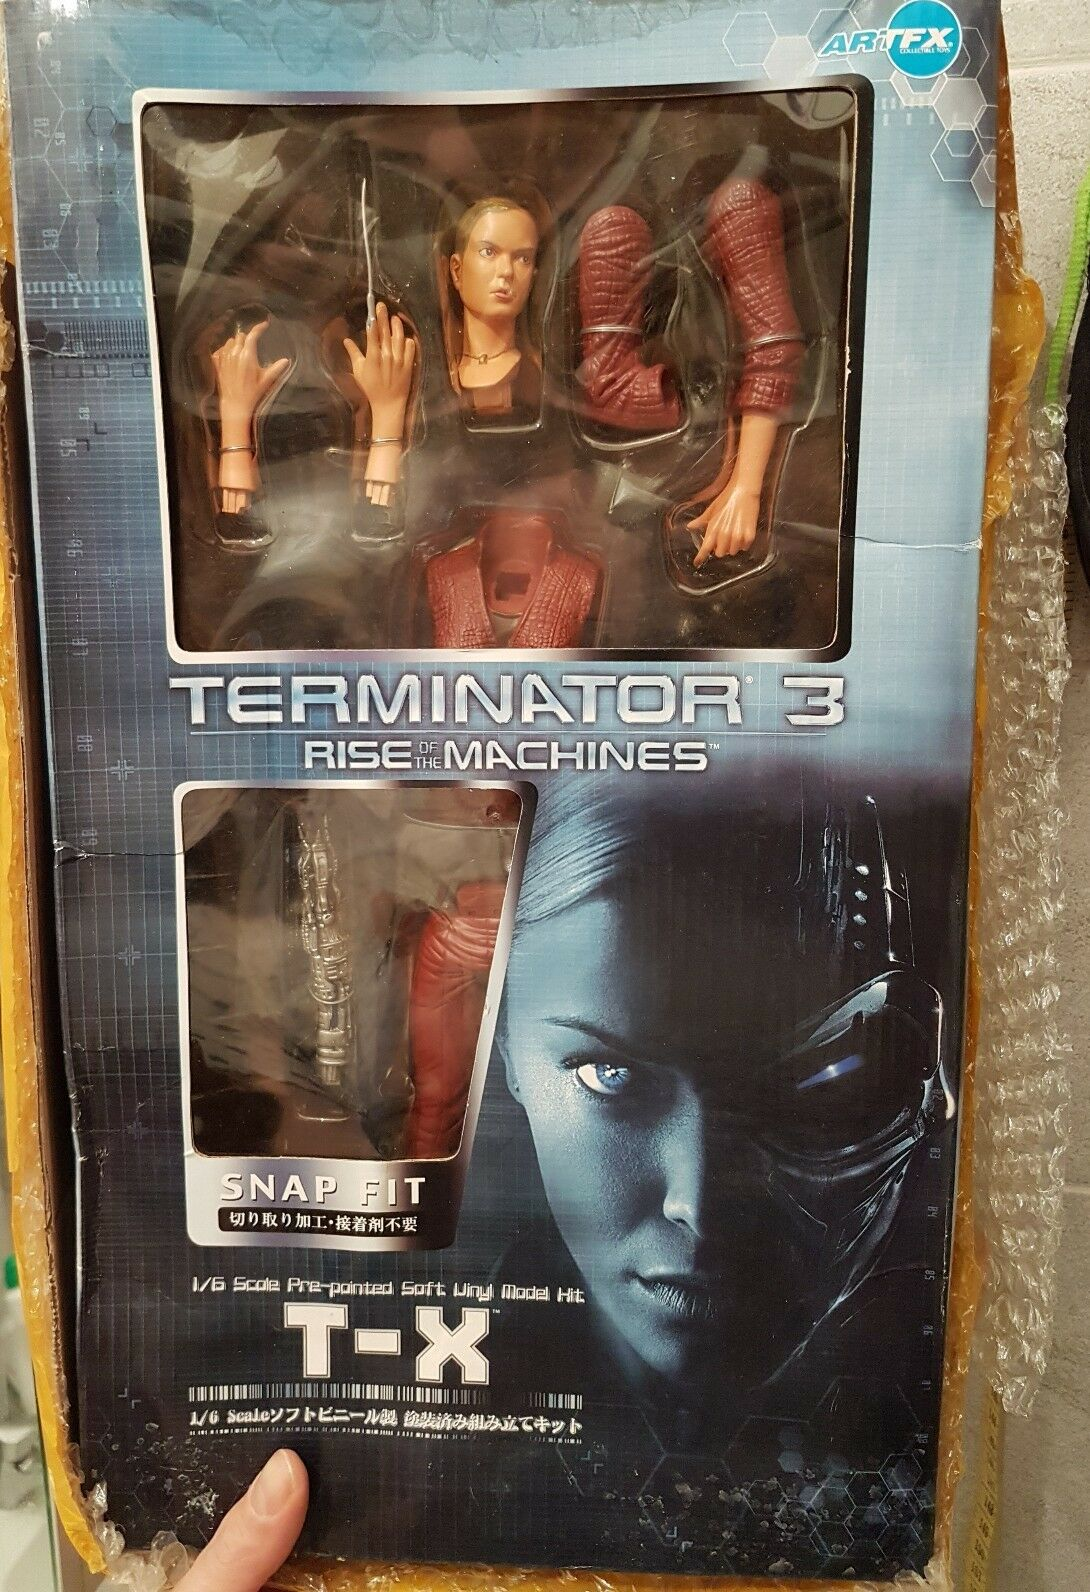 Teminator 3 TERMINATRIX TX-3 ACTION FIGURE DI 31cm nuova nuova nuova c6af9b